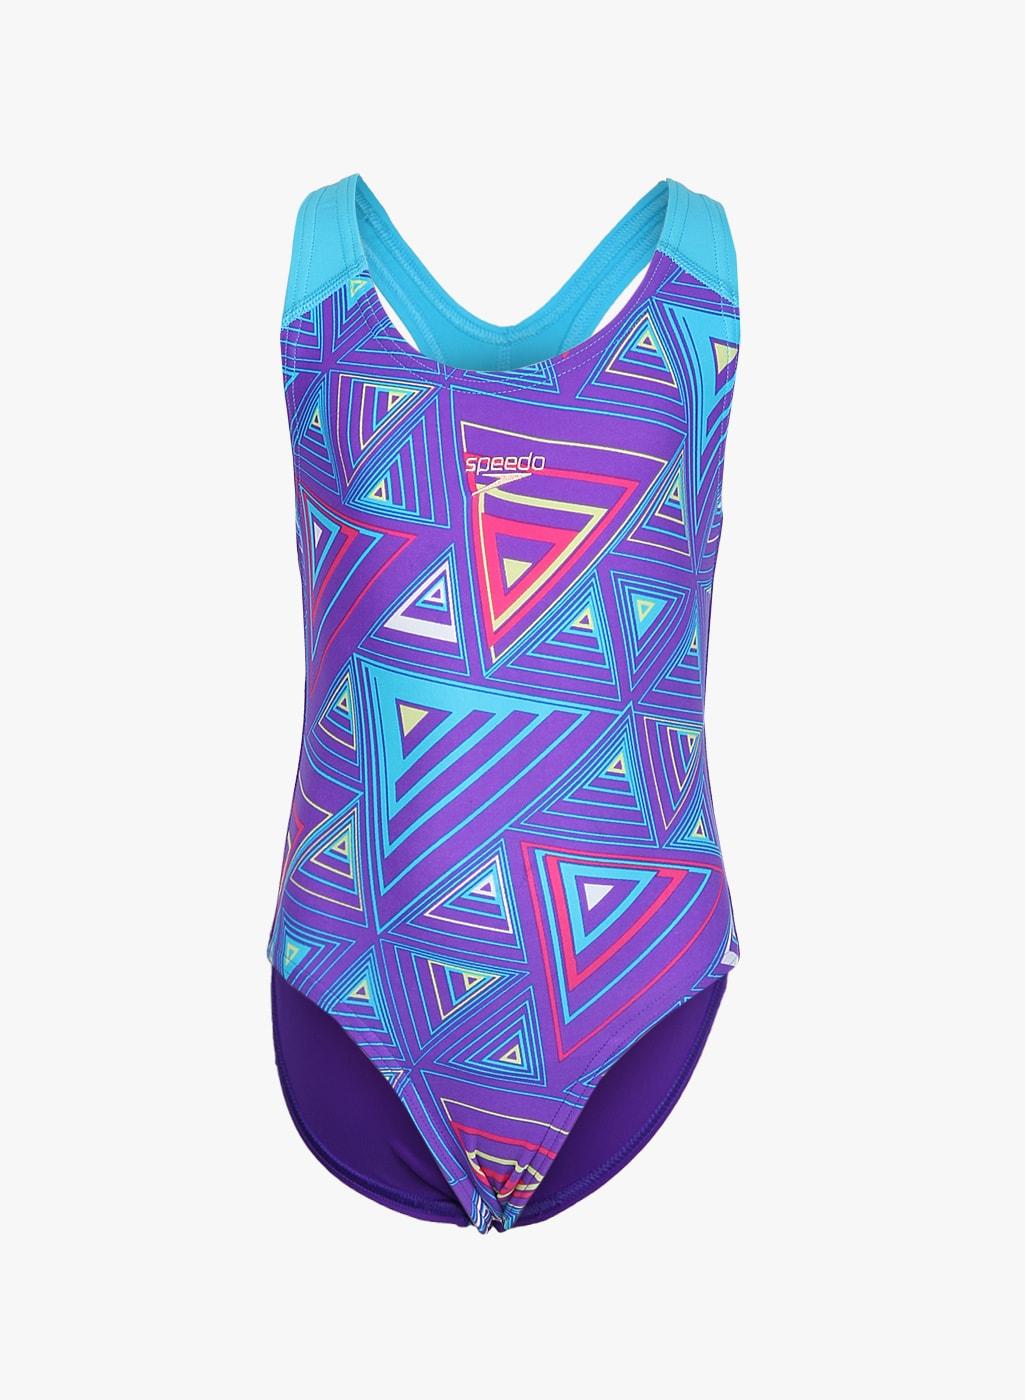 18838abc5e Speedo Swimwear - Buy Speedo Swimwear online in India